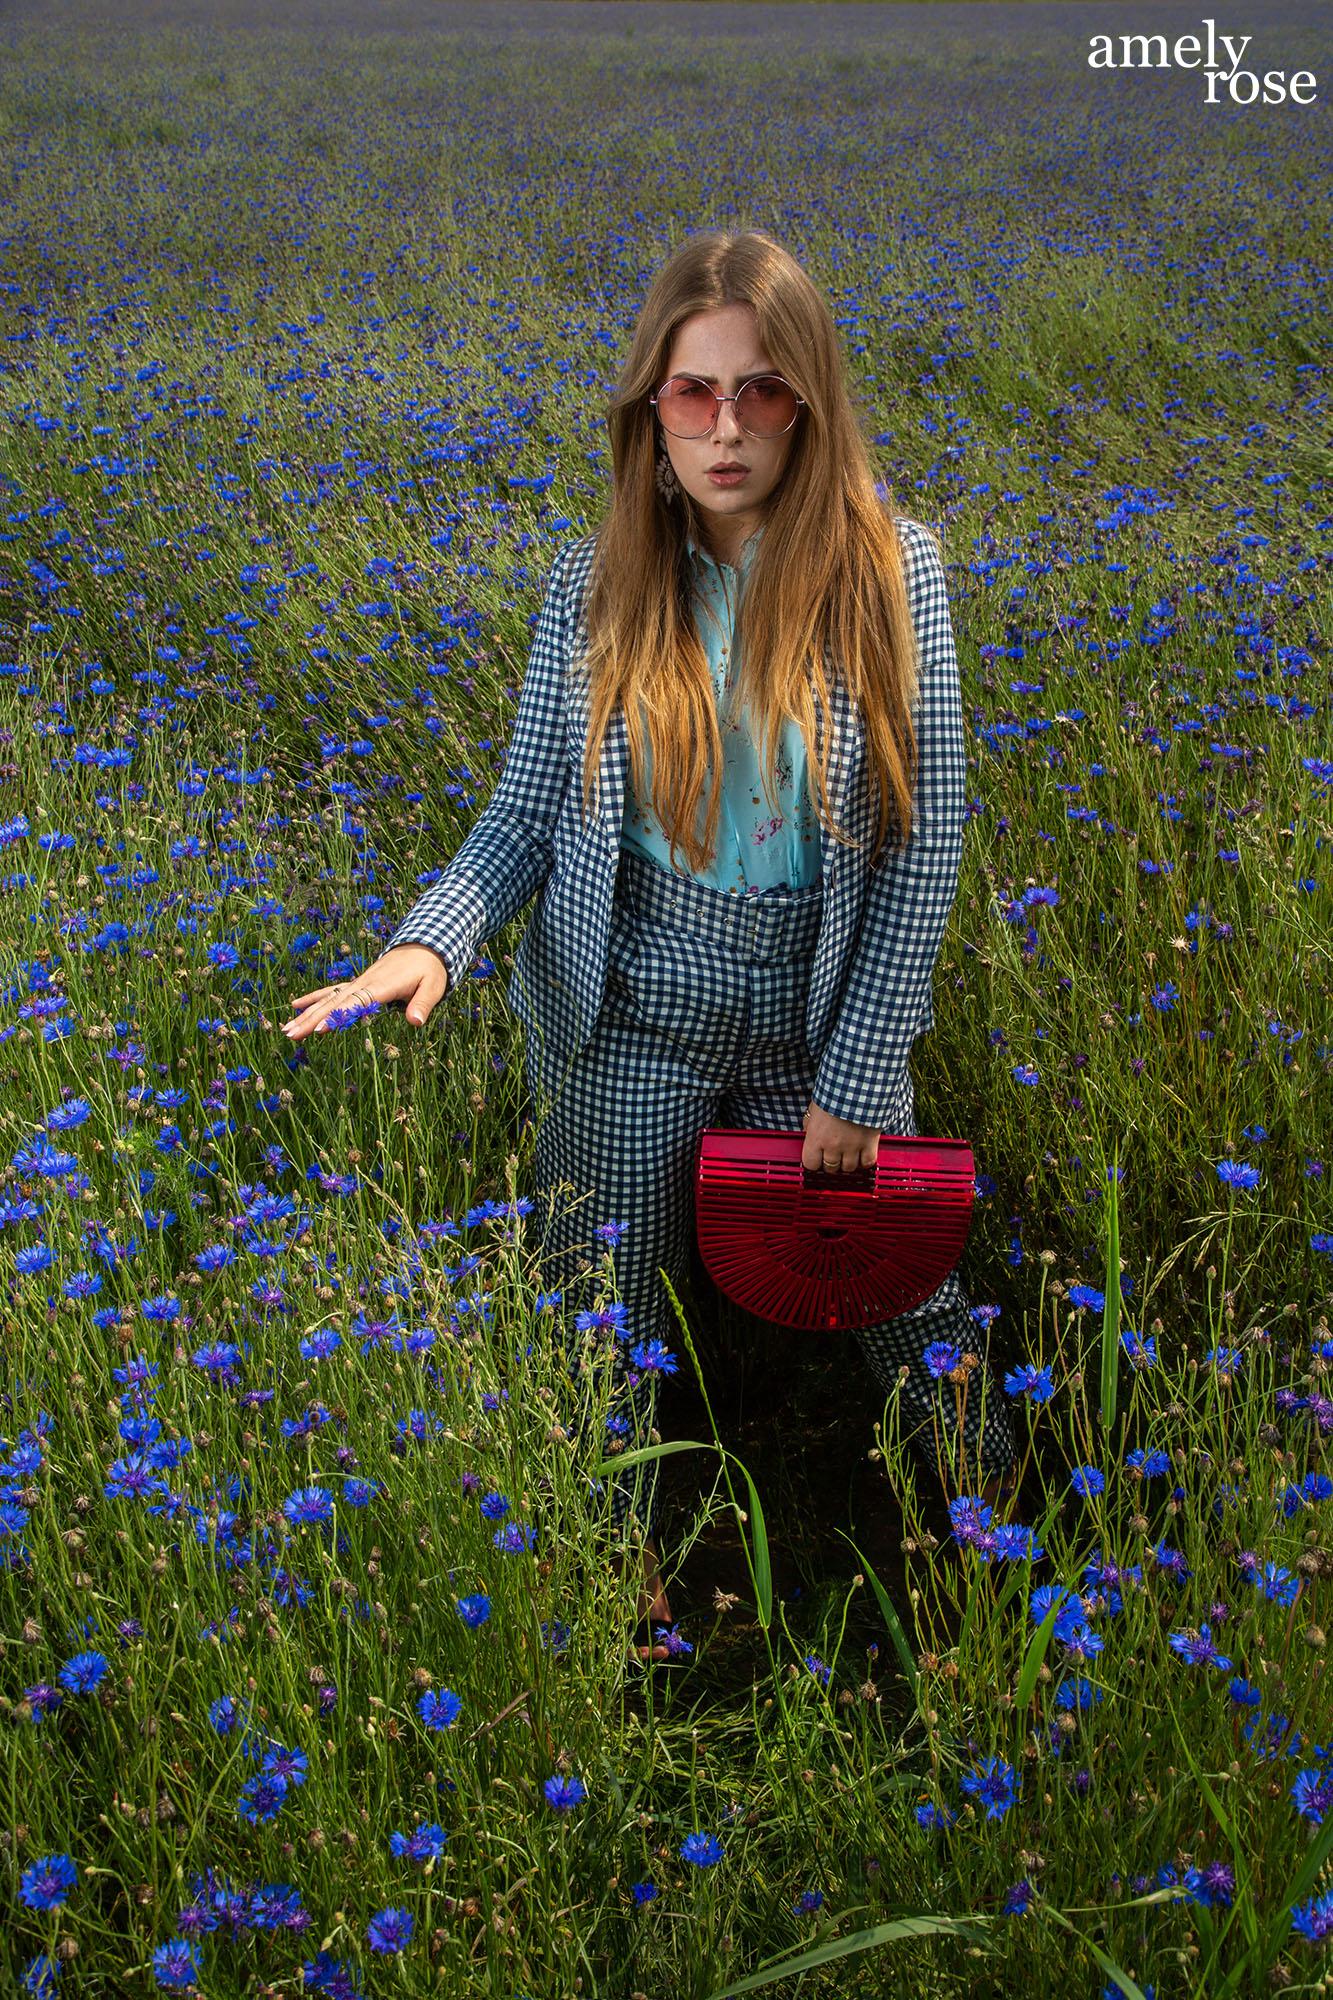 amely rose, amelyrose, fashionblogger, netherland, flower, flowerfield, blumen, blumenfeld, summerlook, karomuster, flowerpower,